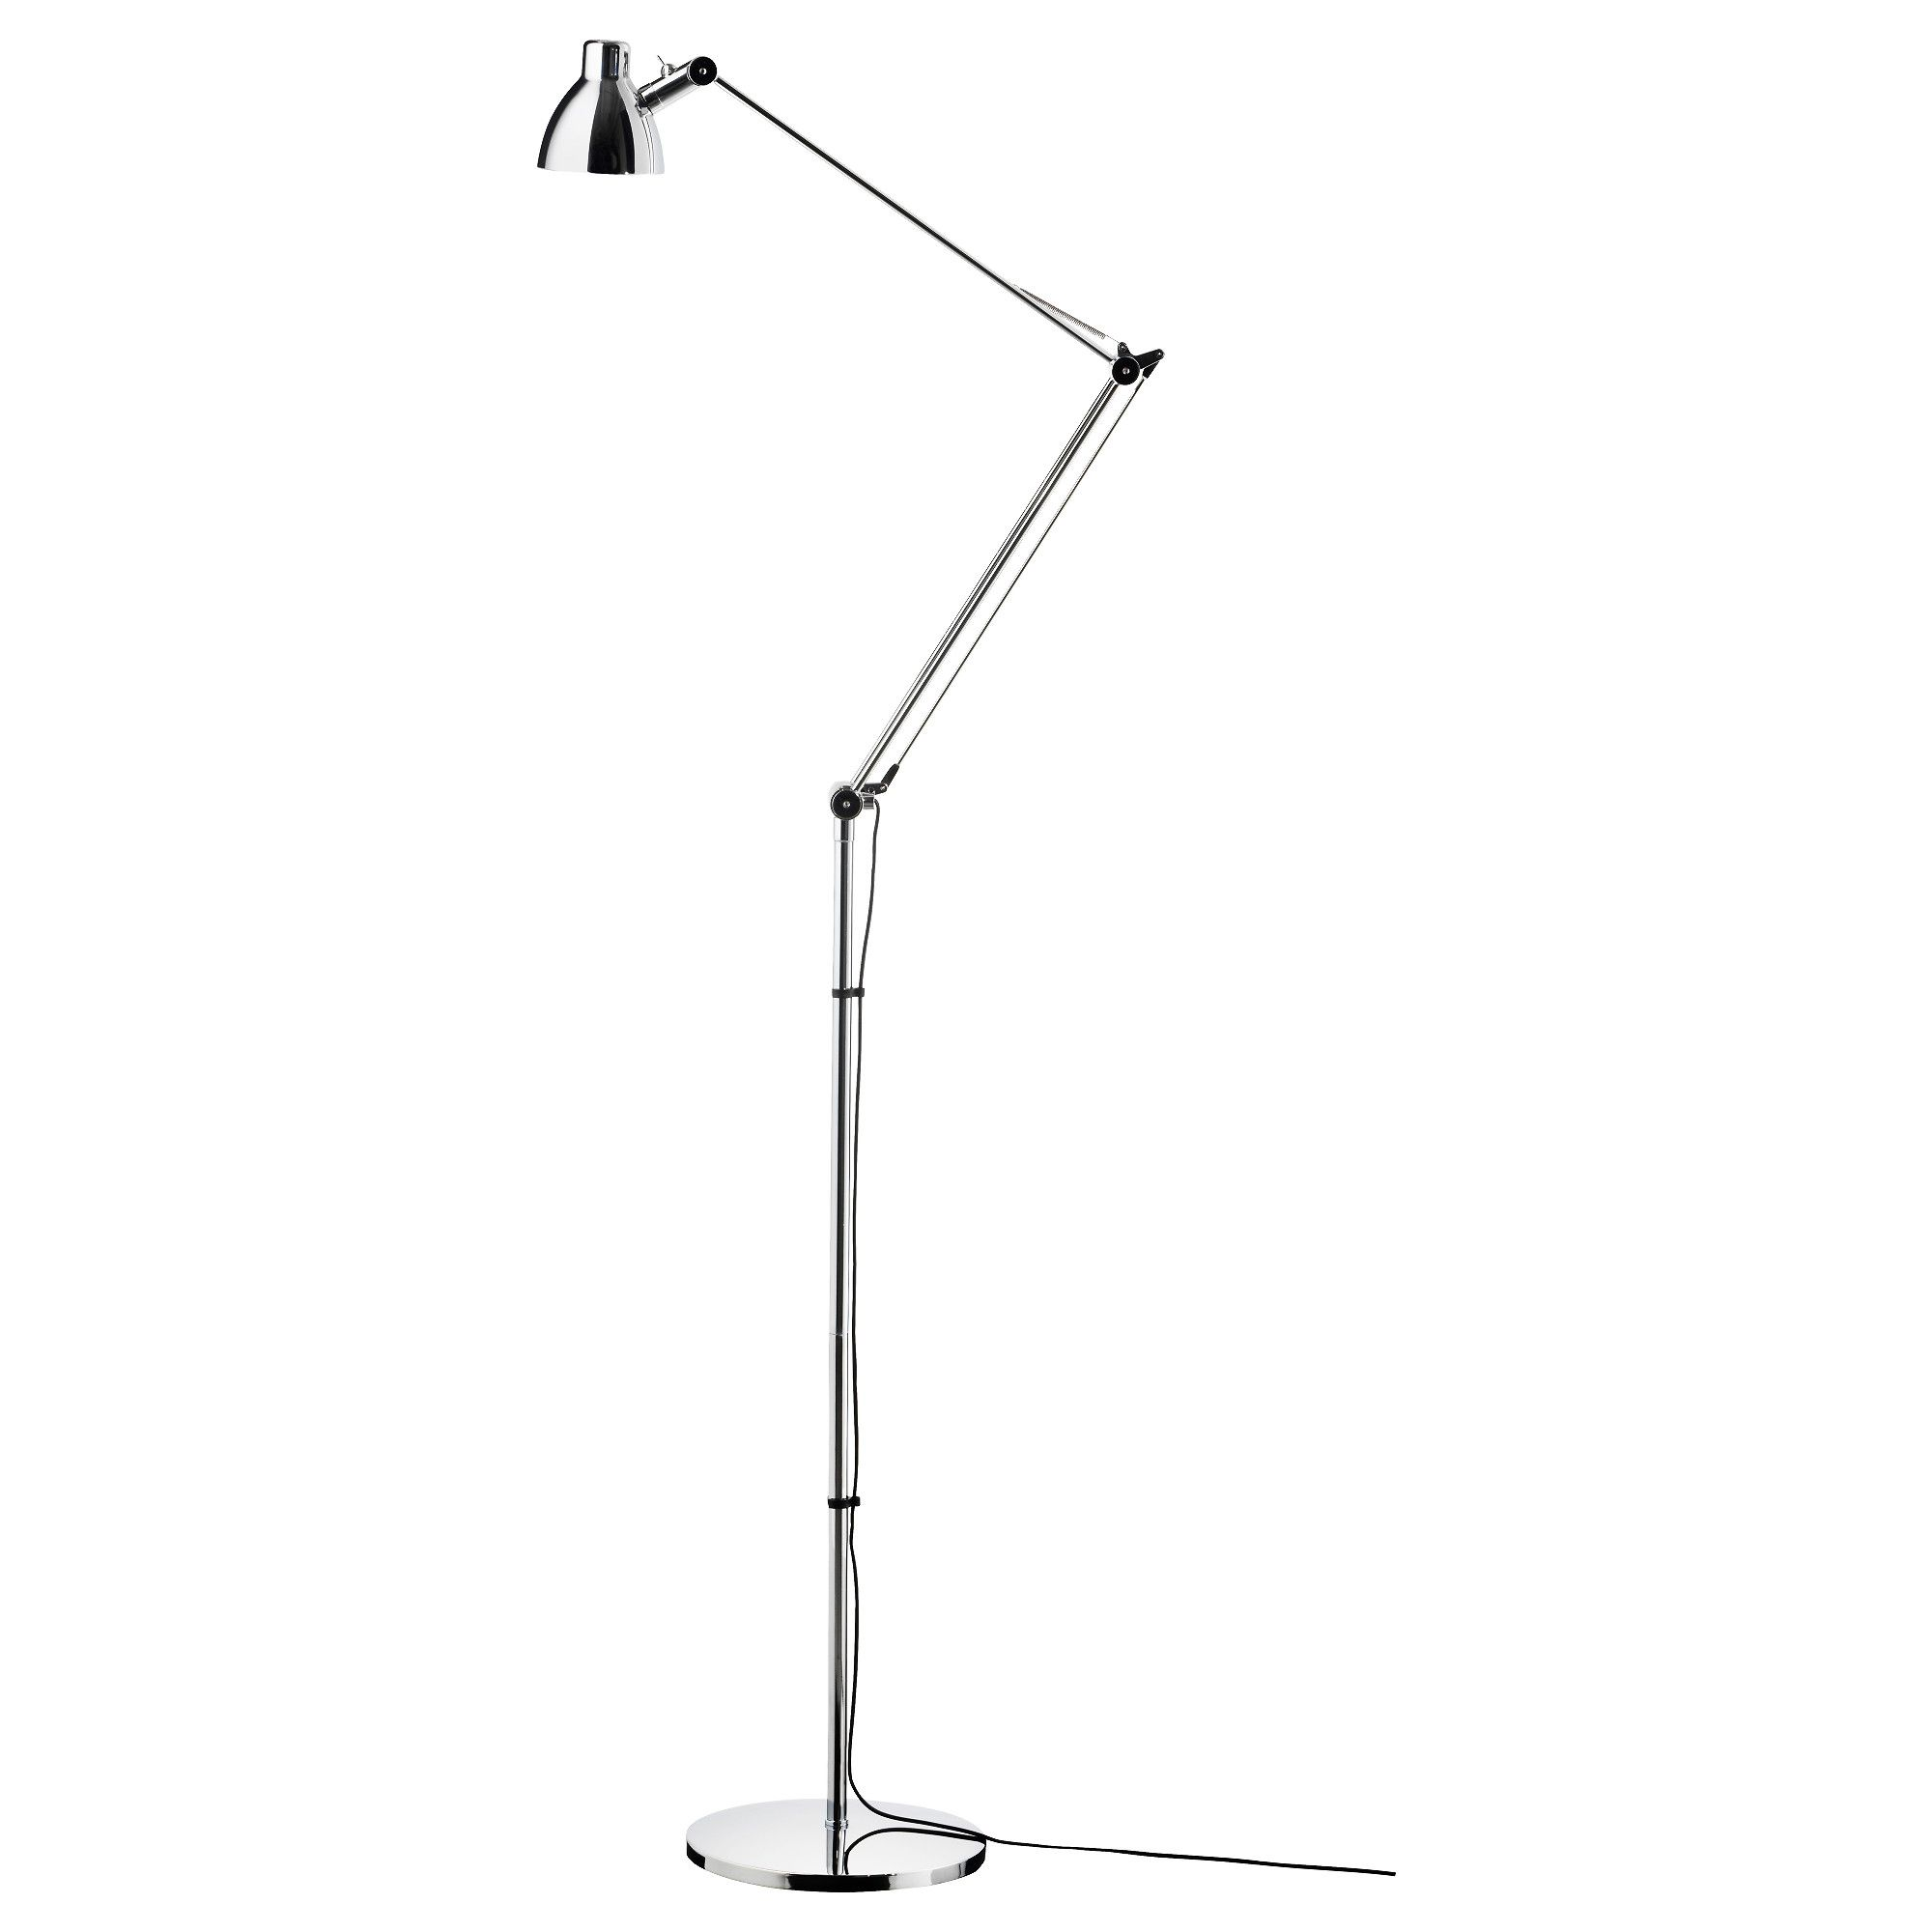 Full Size of Stehlampen Ikea Stehlampe Lampe Schirm Dimmbar Lampen Moderne Papier Lampenschirm Antifoni Floor Lamps Betten 160x200 Modulküche Wohnzimmer Küche Kaufen Wohnzimmer Stehlampen Ikea